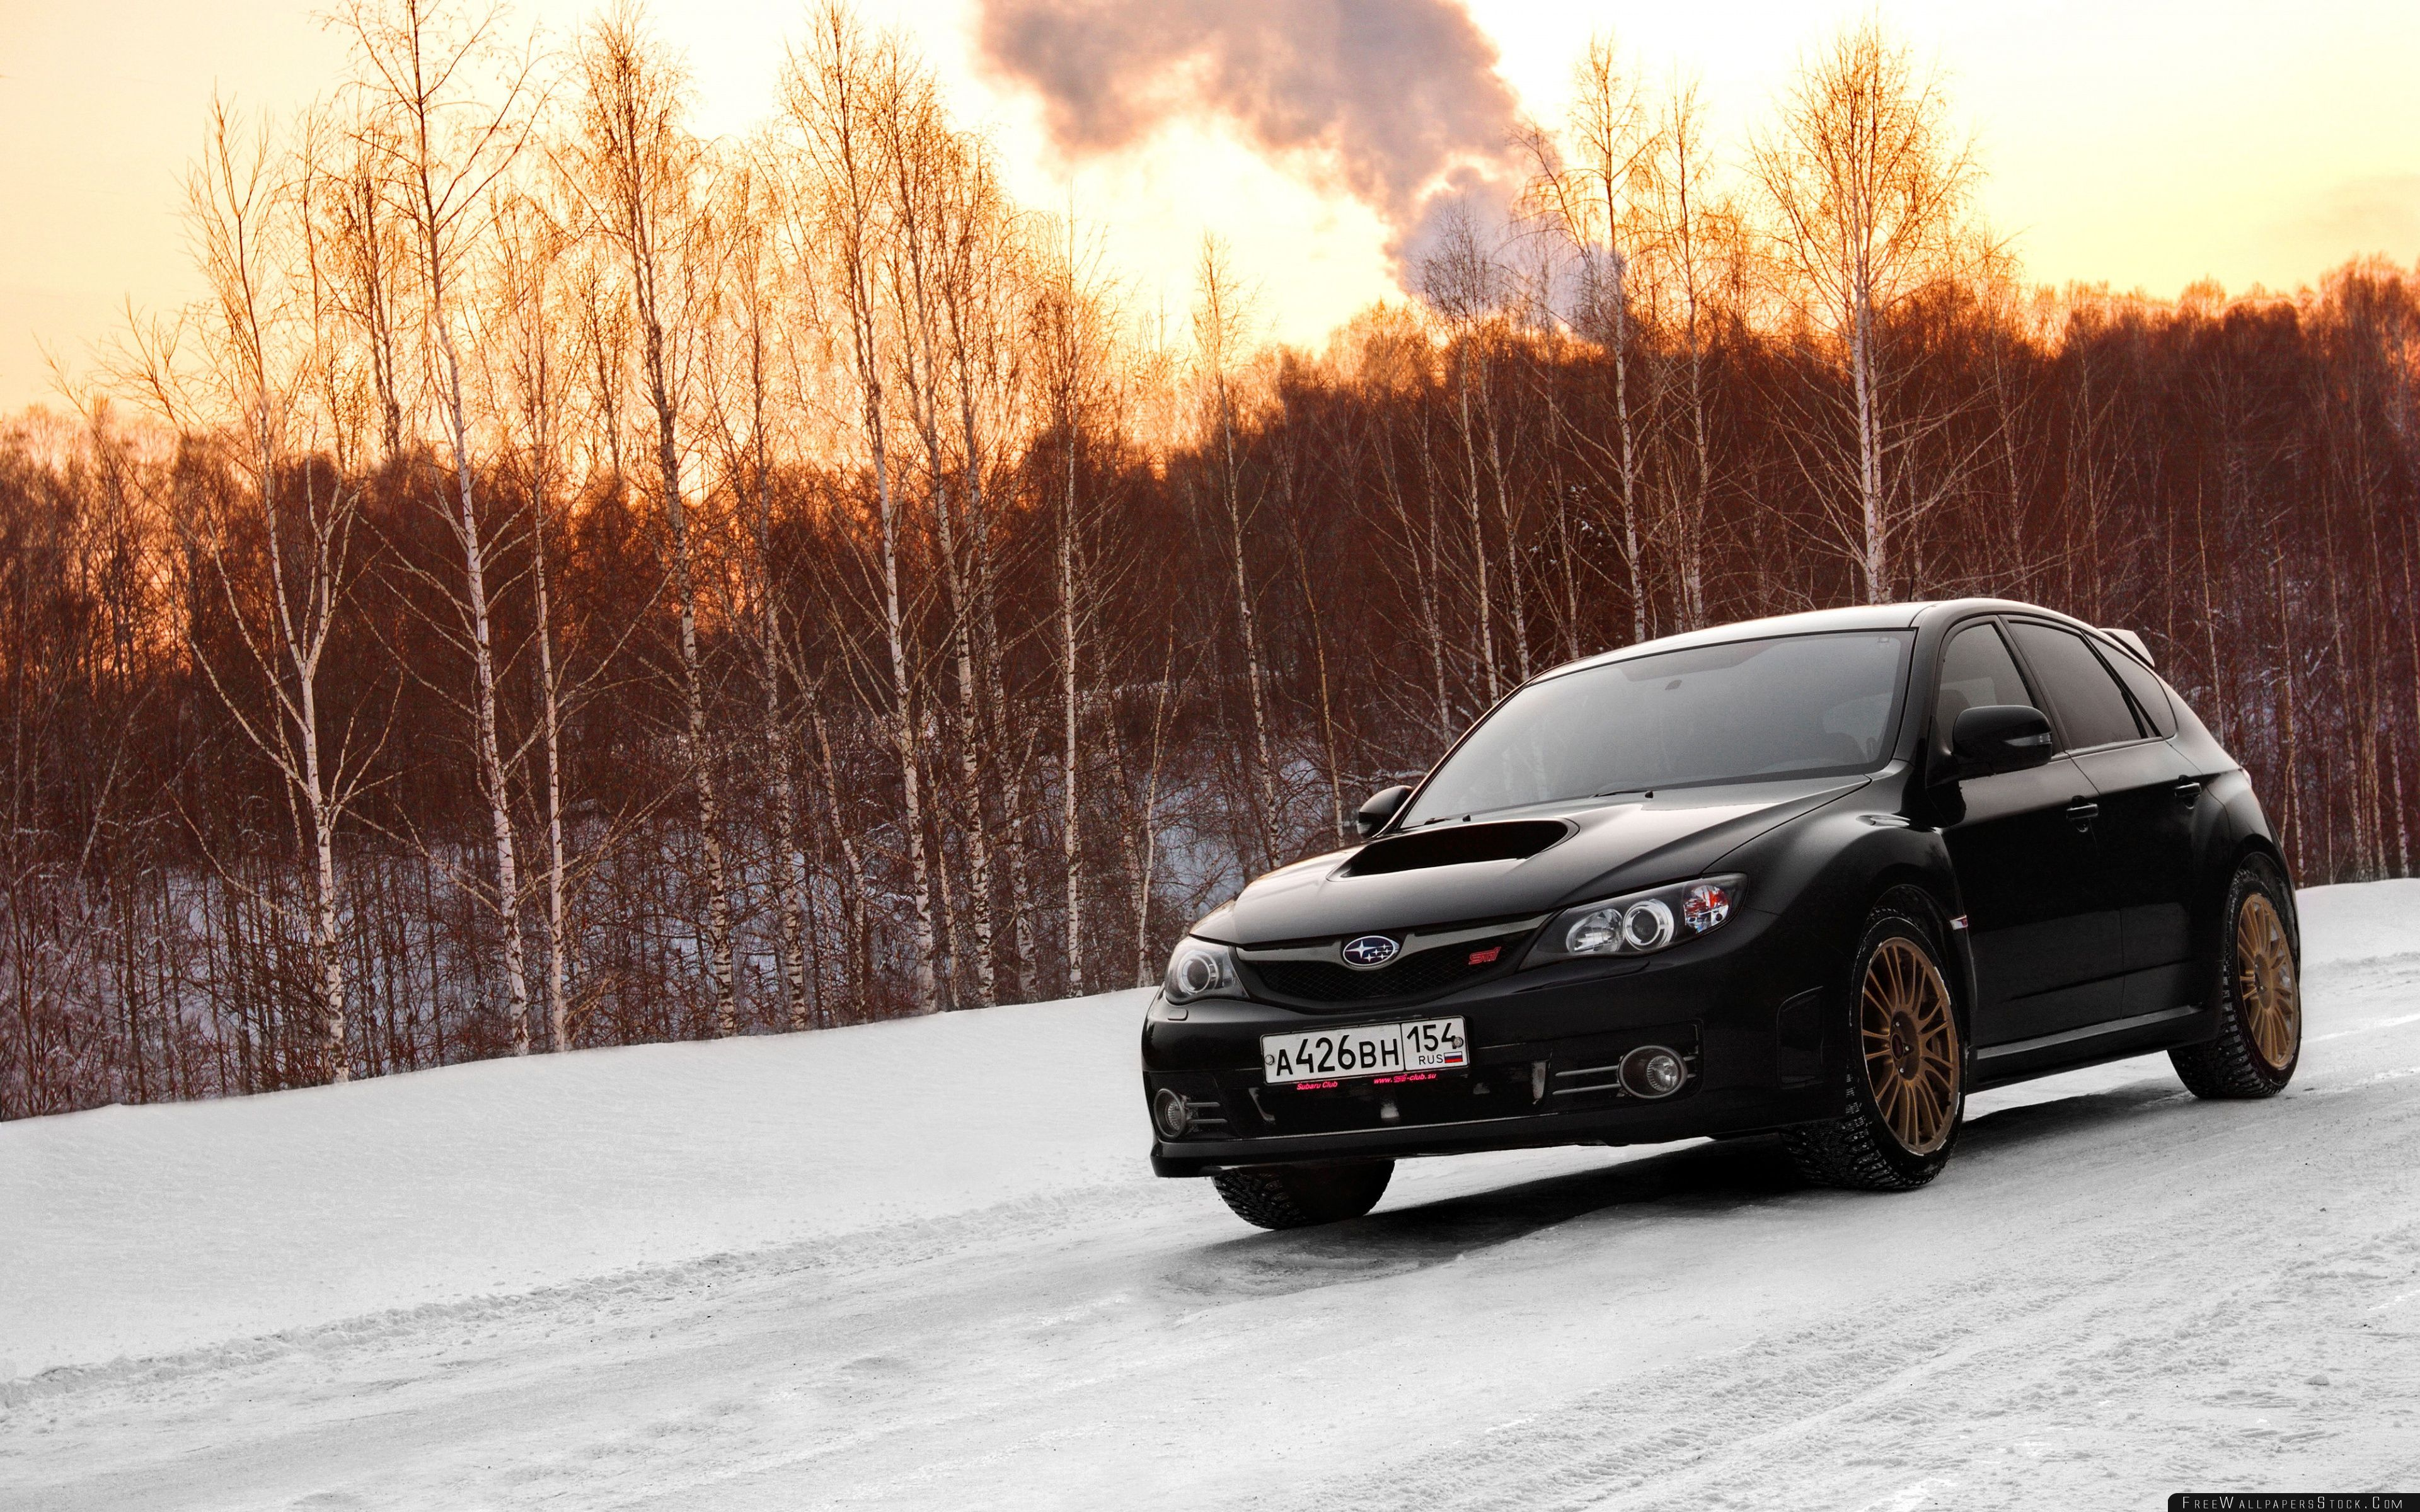 Download Free Wallpaper Subaru Impreza Wrx   Snow